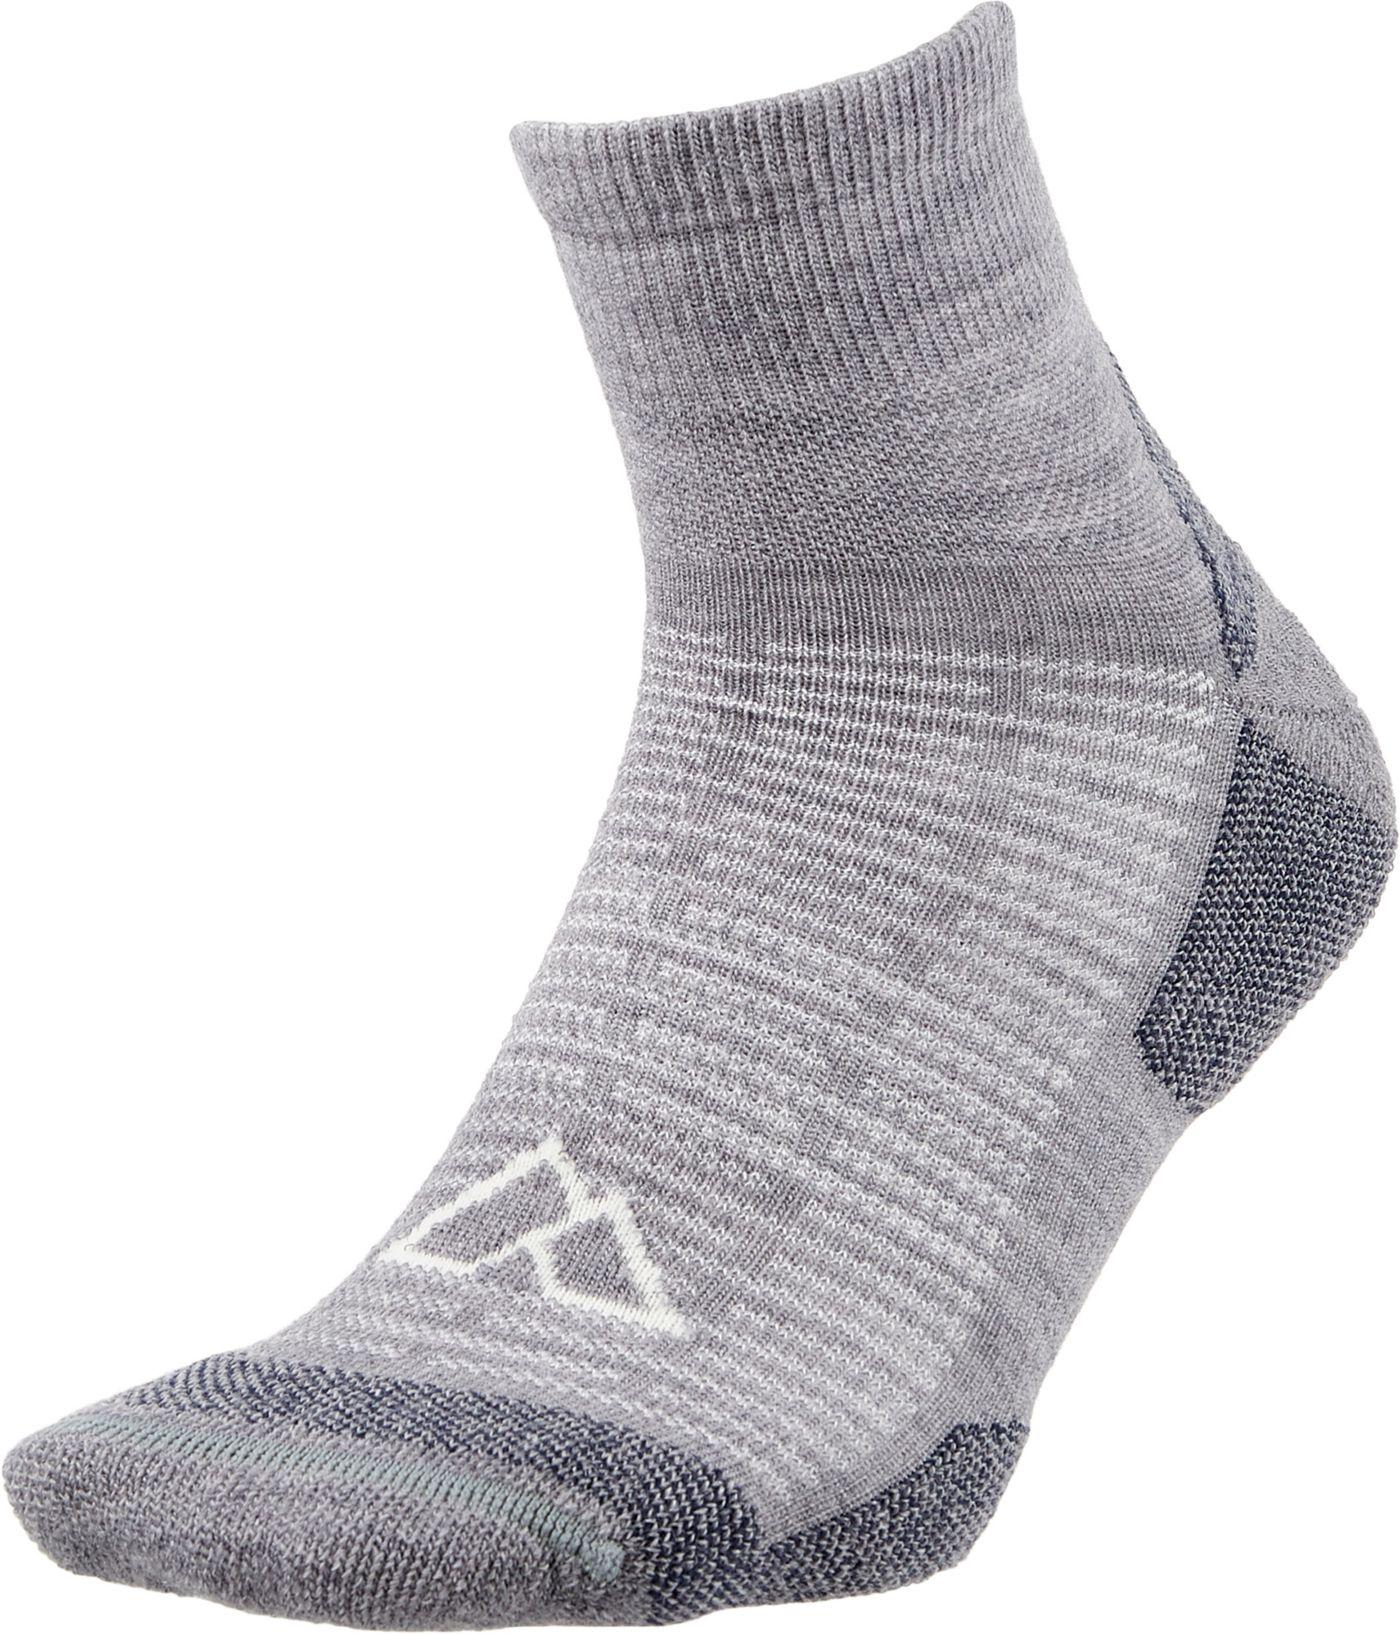 Alpine Design Quarter Hiking Socks